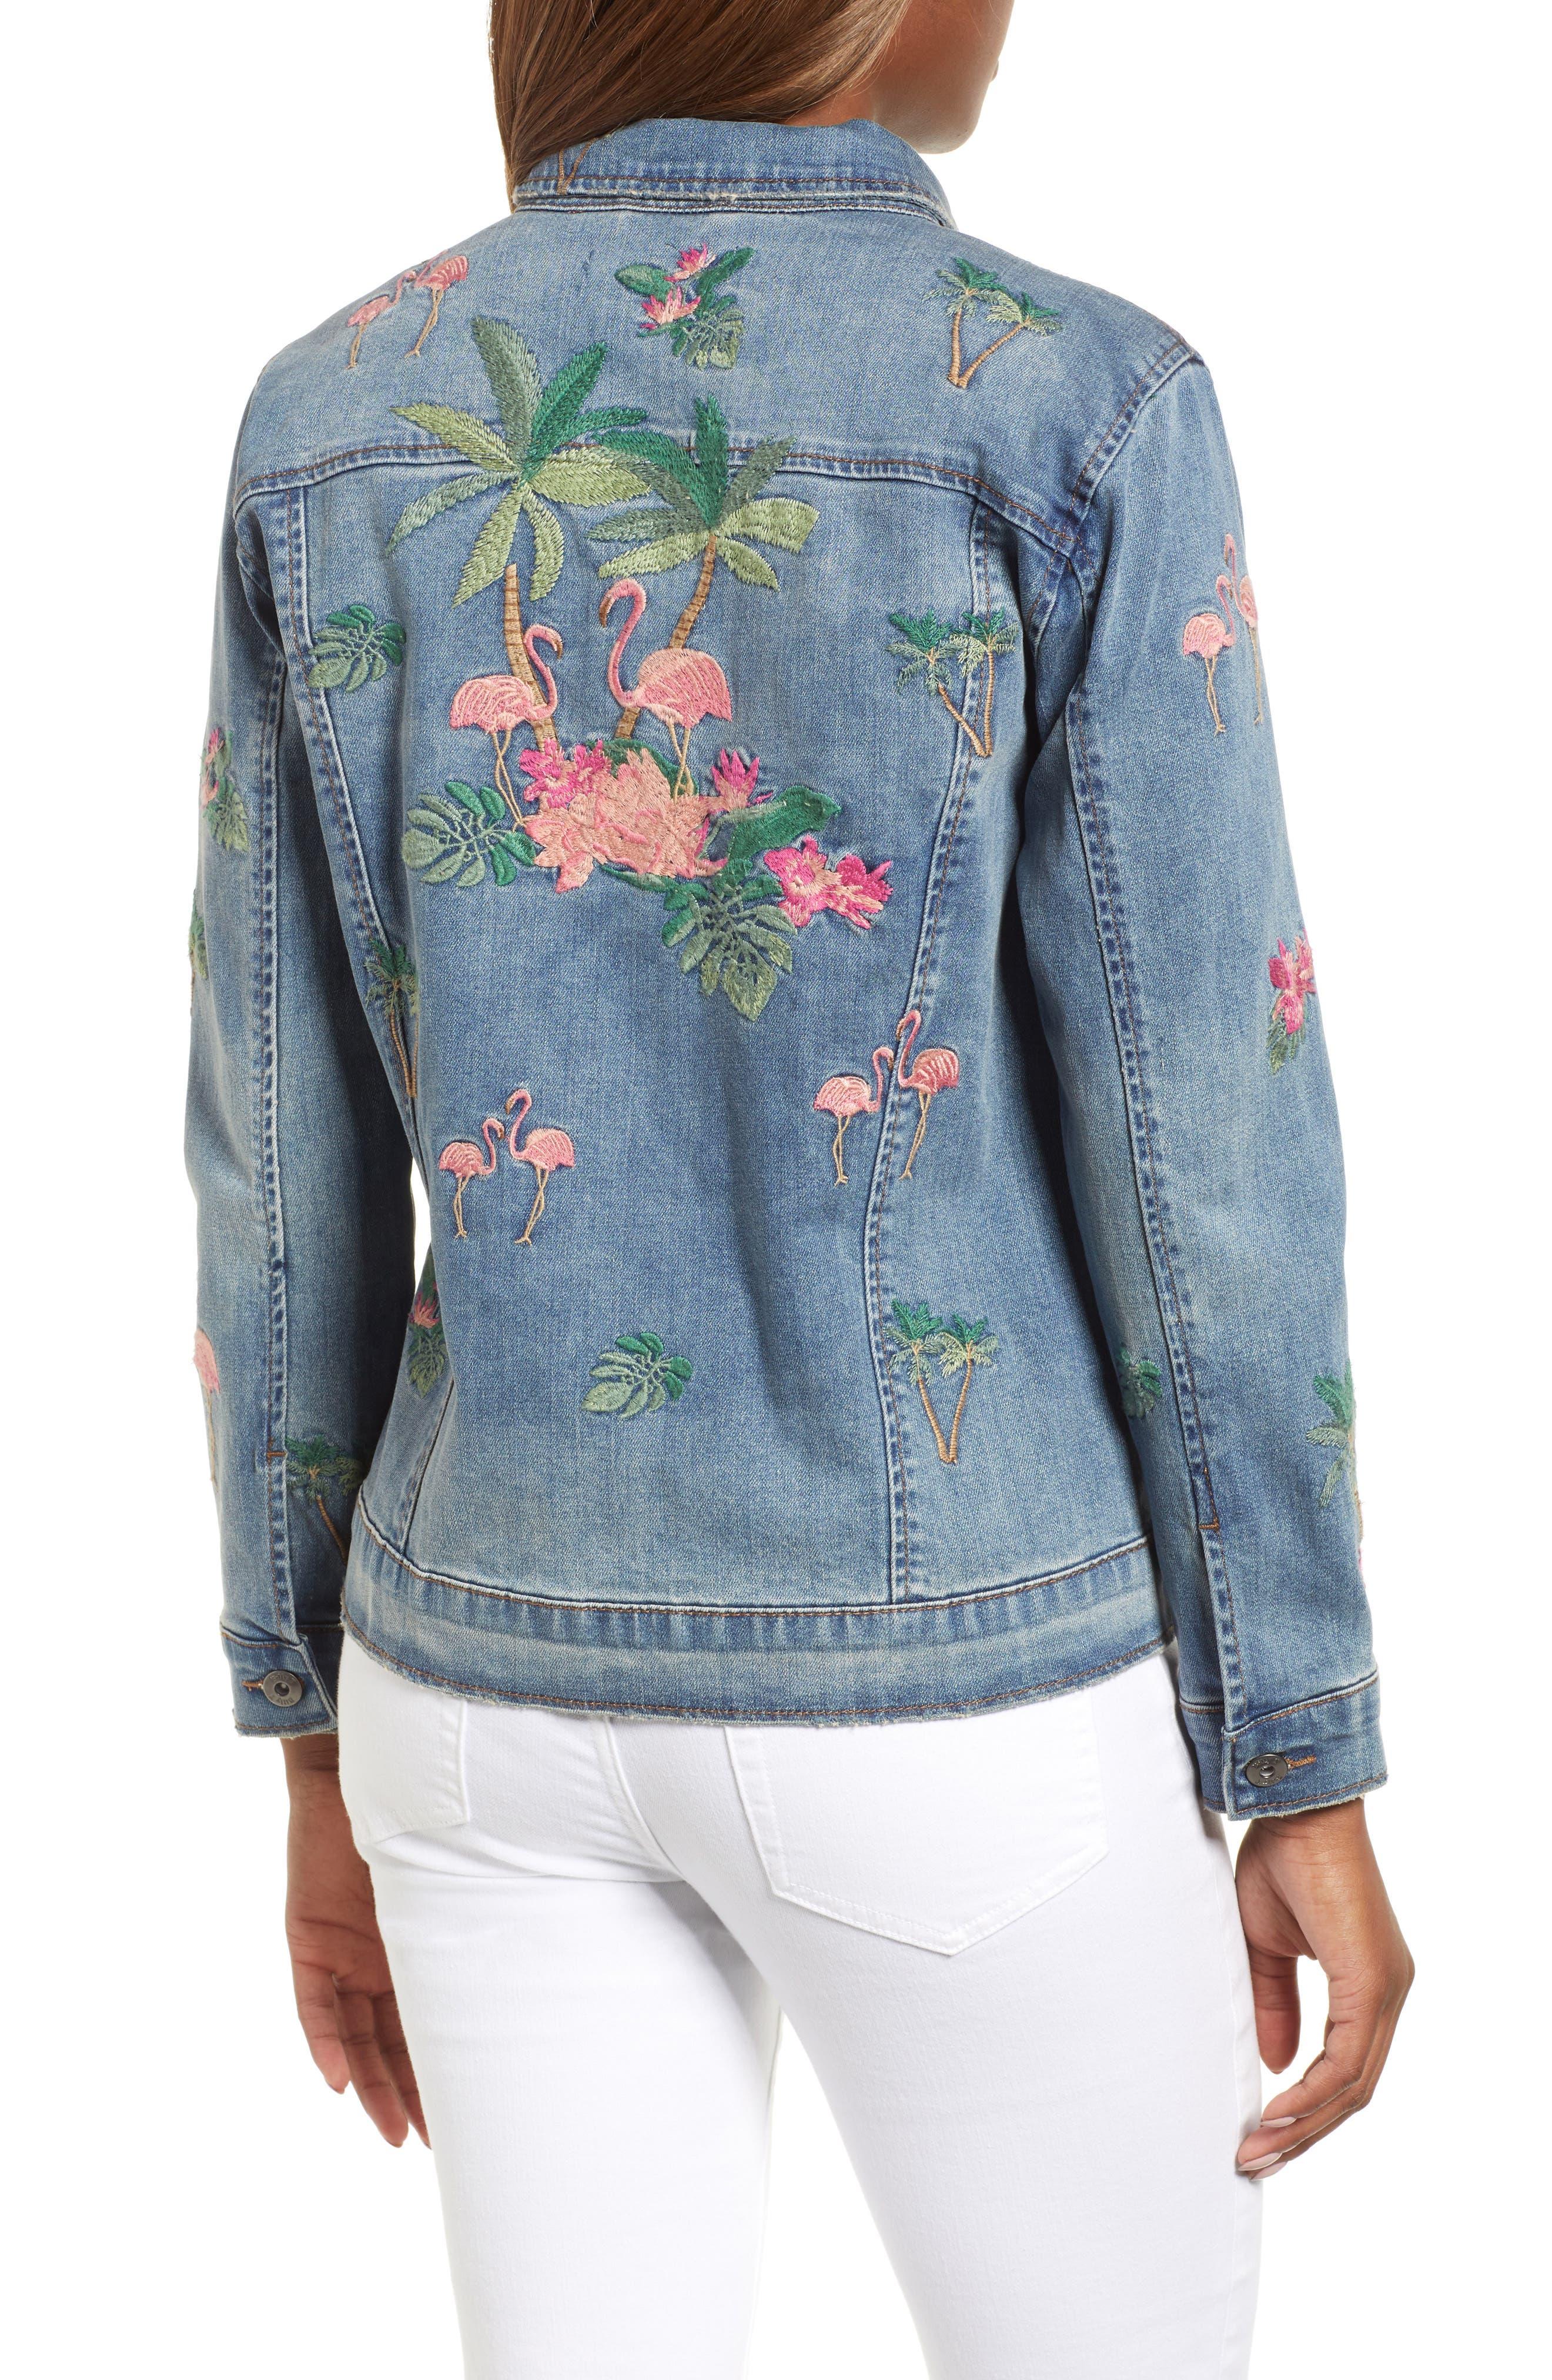 Flamingo Embroidered Denim Jacket,                             Alternate thumbnail 2, color,                             Blue W/ Embroider